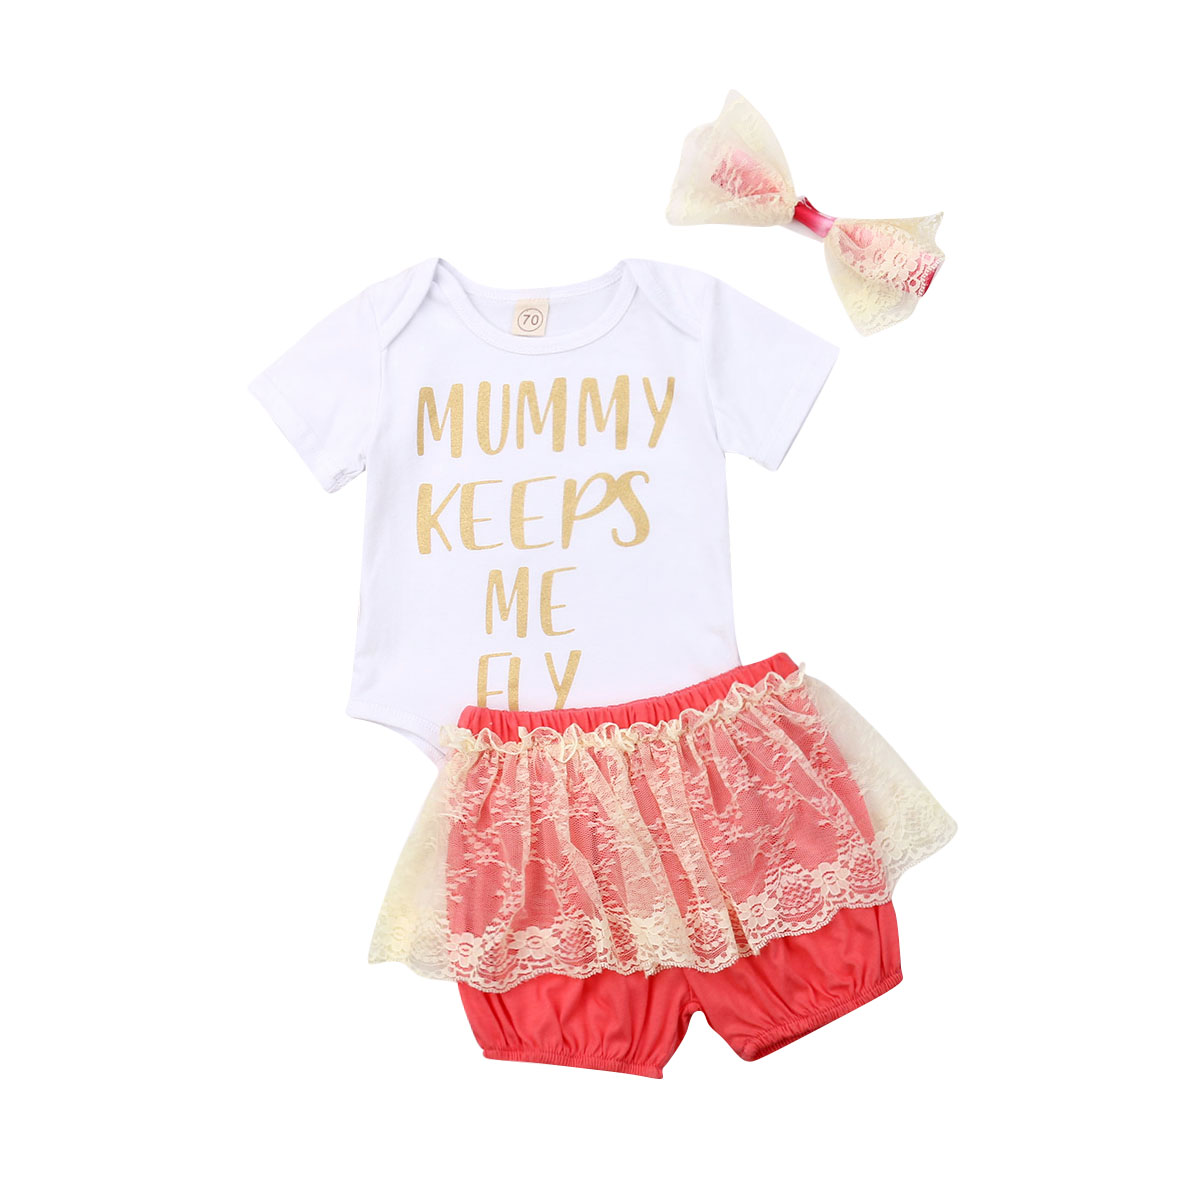 3PCS Newborn Toddler Clothes Baby Girls Dress+Pants Shorts+Headband Outfit Sets